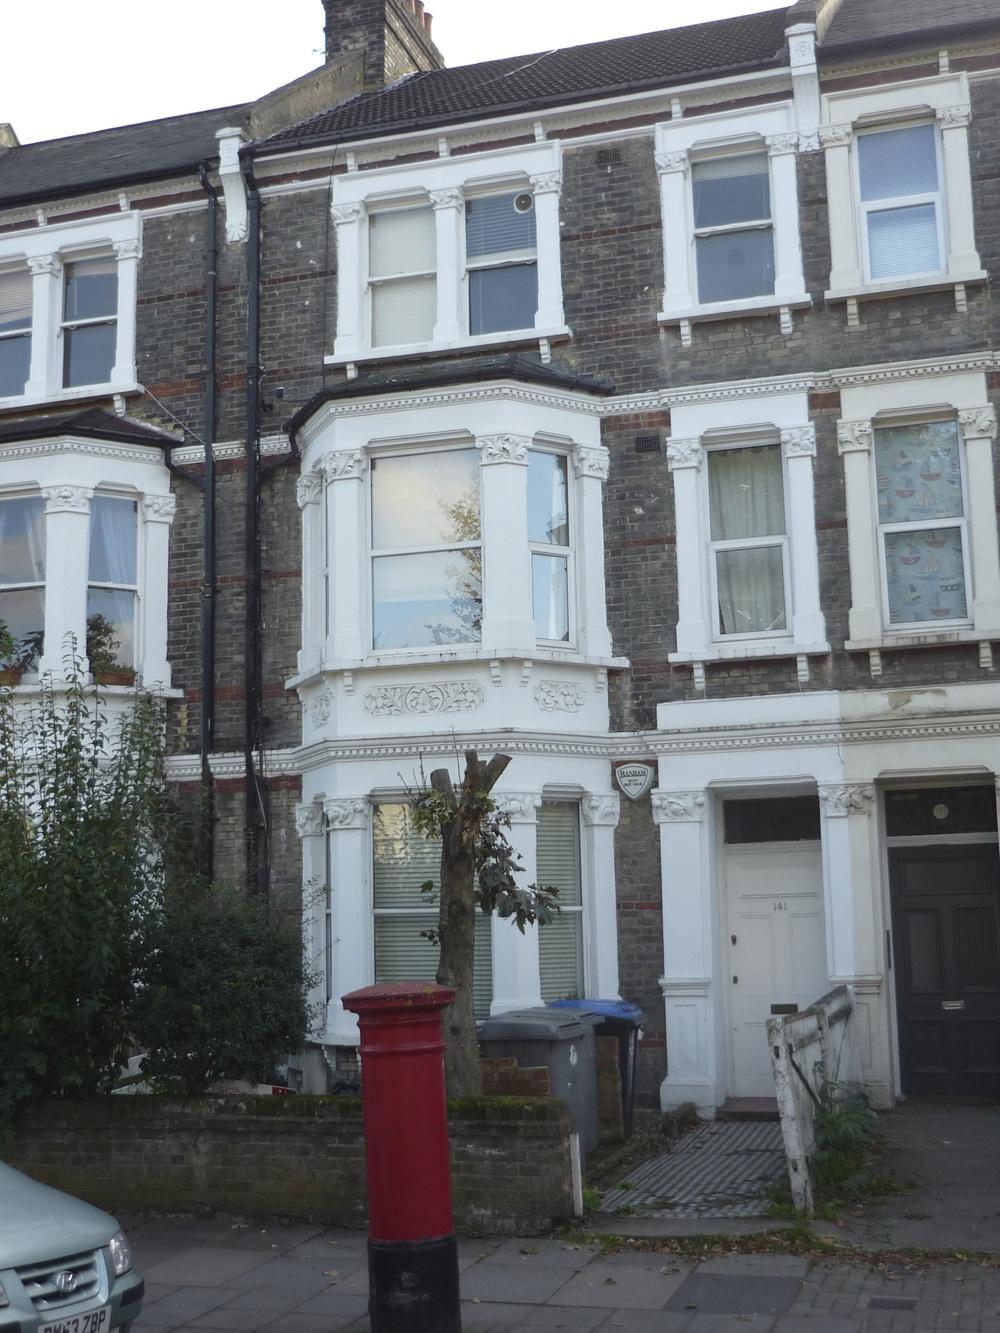 141 Harvist Road, Kilburn, London